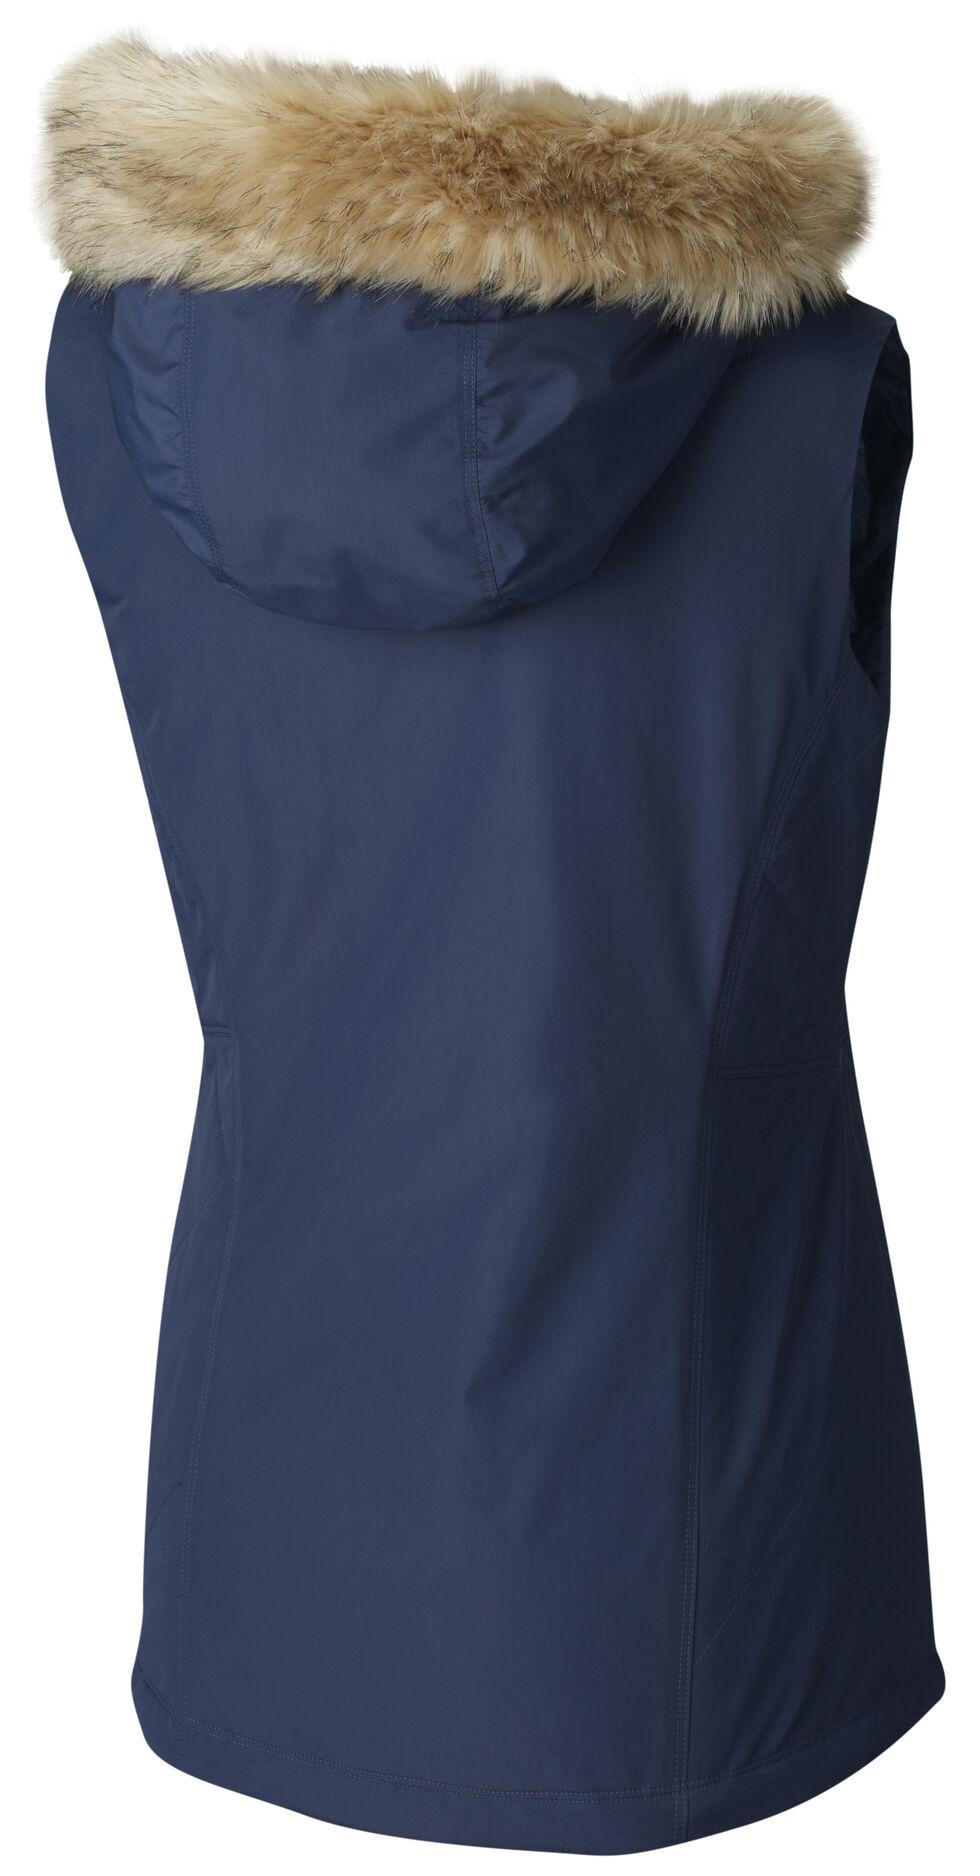 Mountain Hardwear Women's Potrero Vest, Grey, hi-res